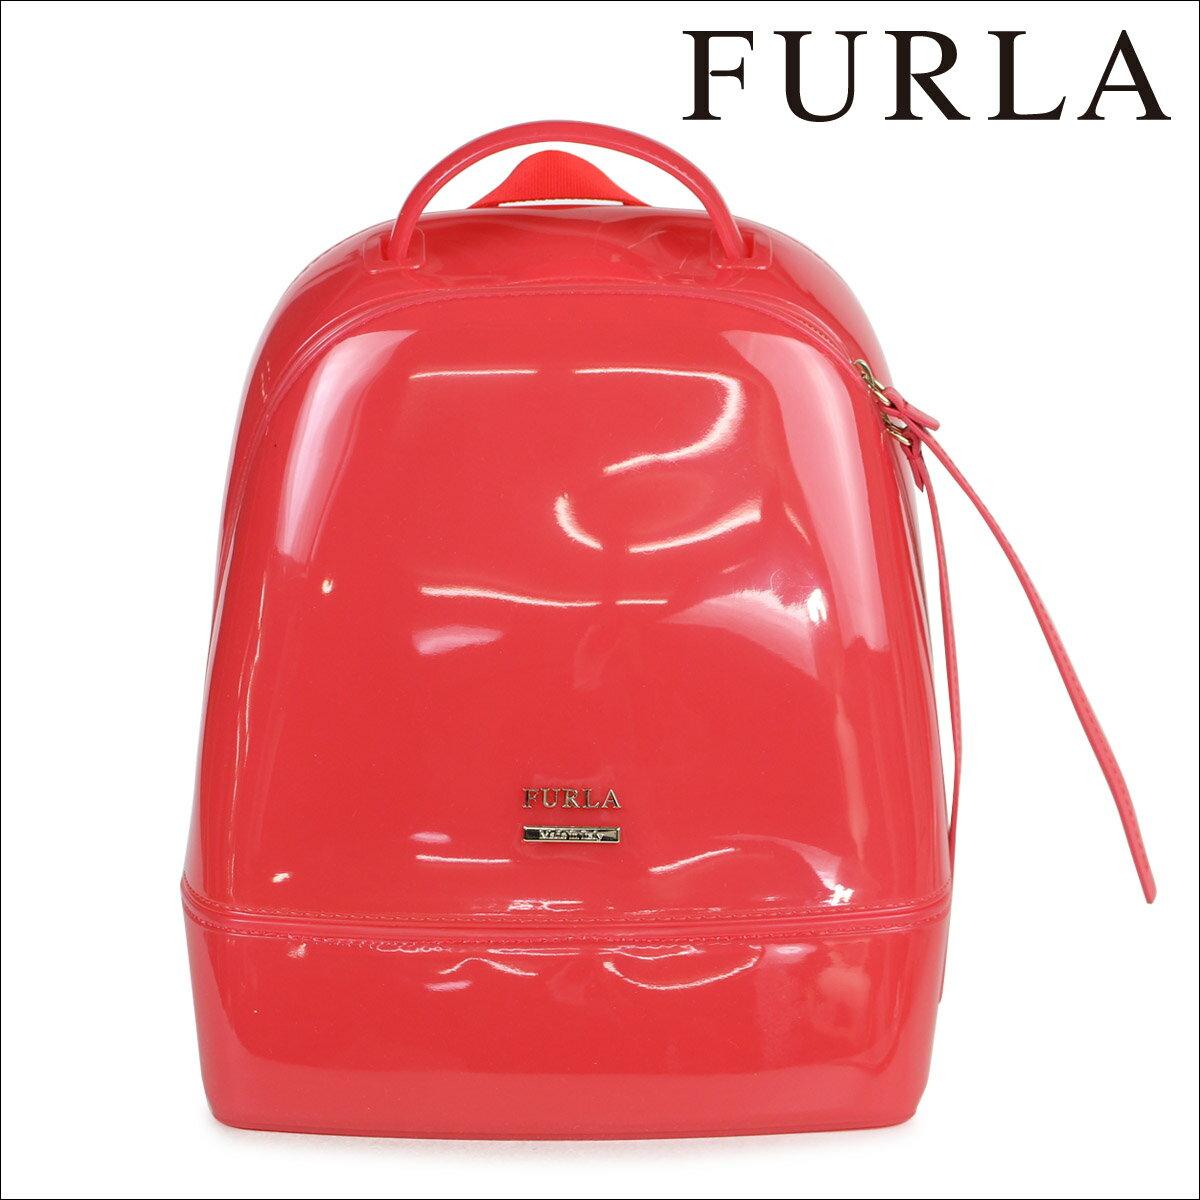 FURLA CANDY S BACK PACK RPSA フルラ バッグ リュック バックパック レディース ピンク 885218